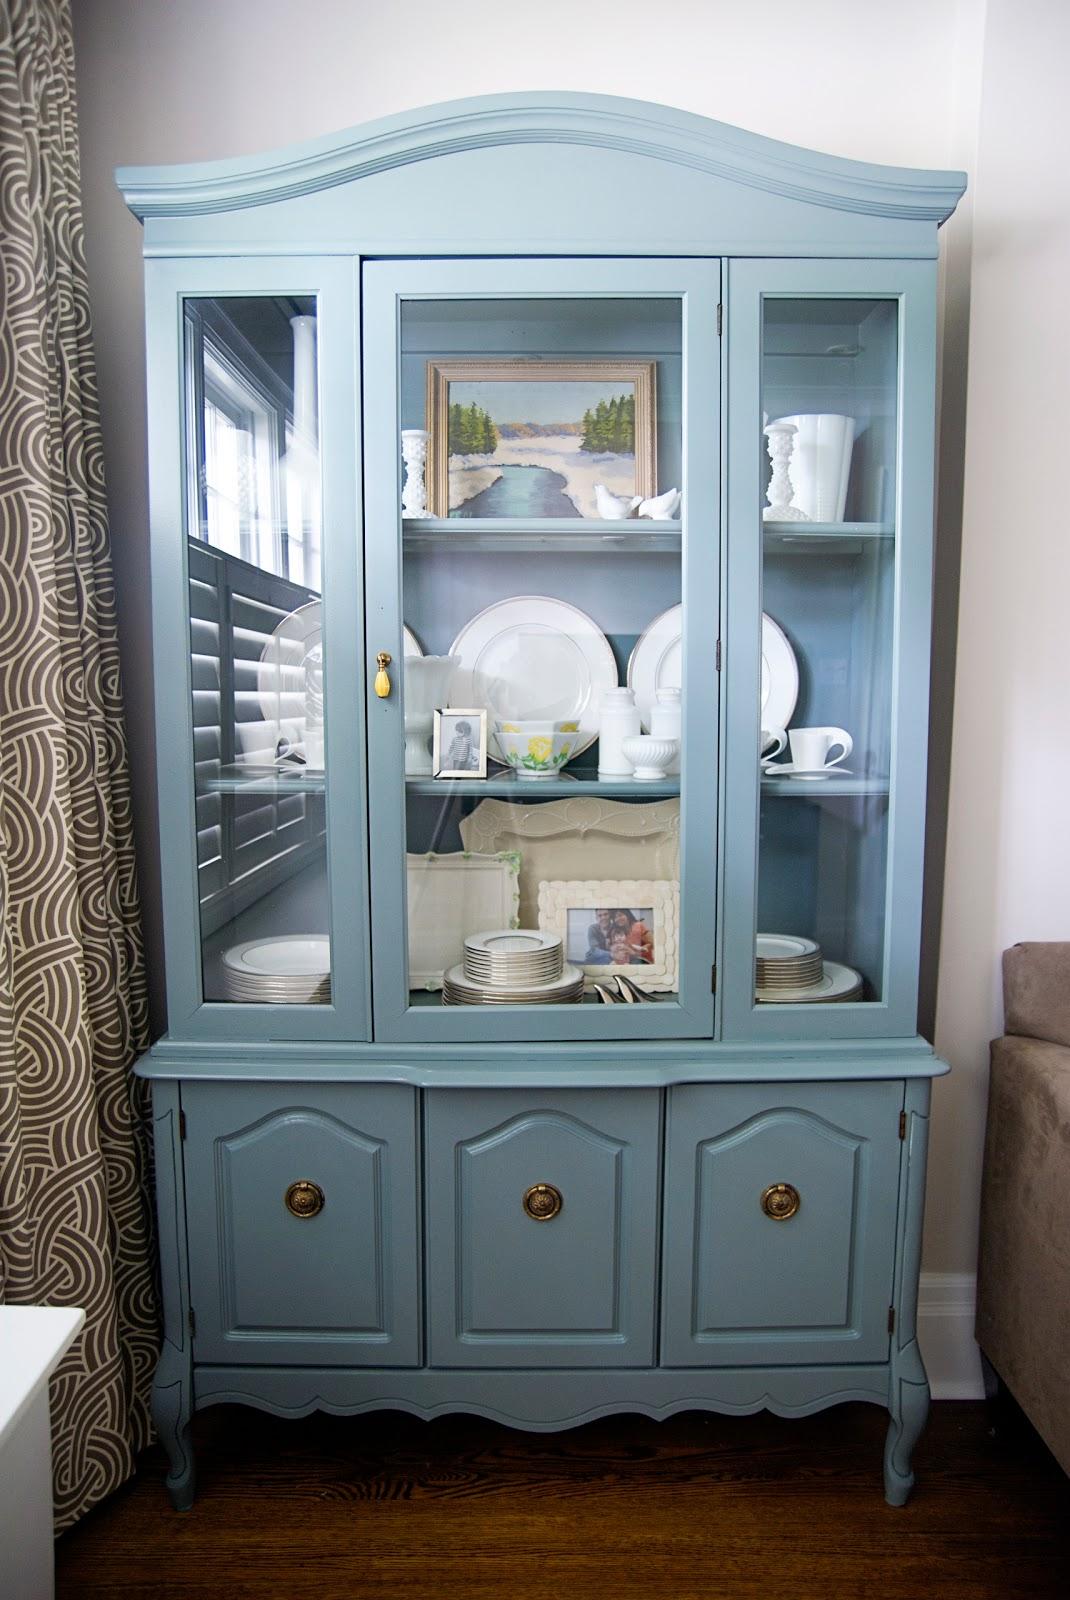 Living Room: A Painted Hutch - Rambling Renovators